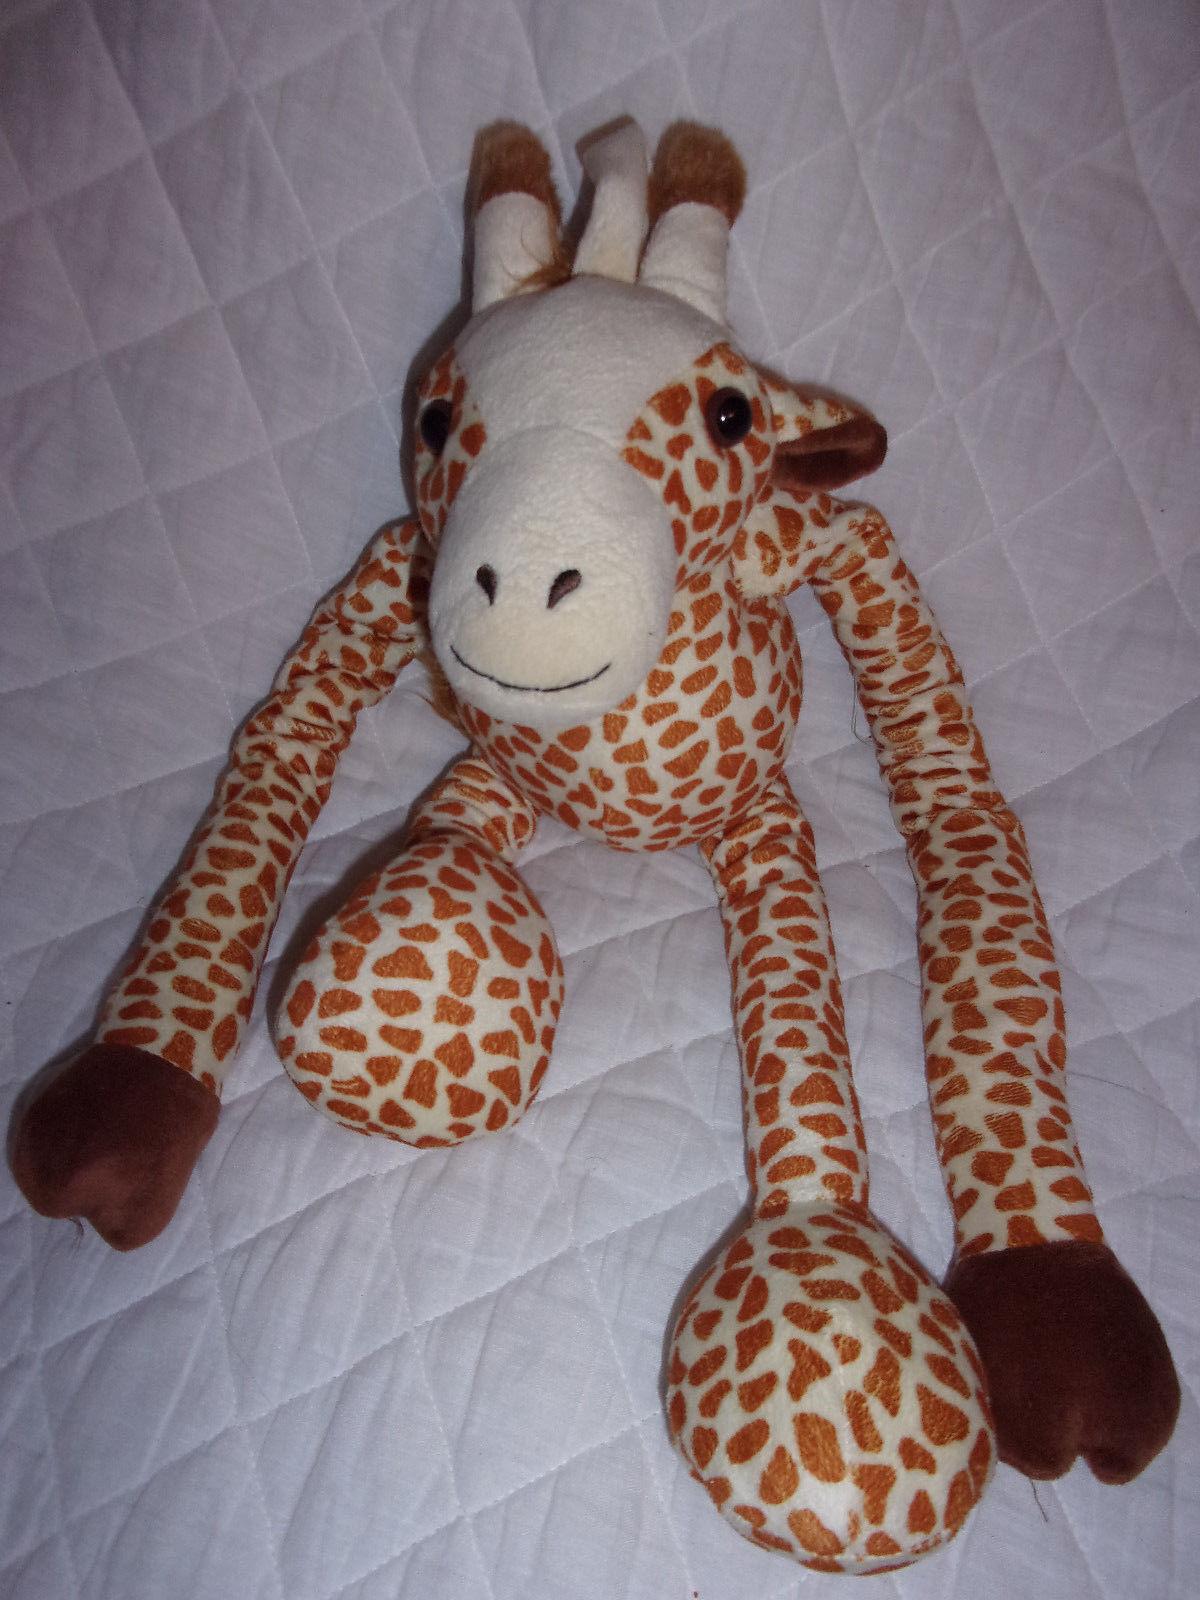 Tug a Lug Giraffe Adjustable Arms Legs 22  Plush Soft Toy Stuffed Animal